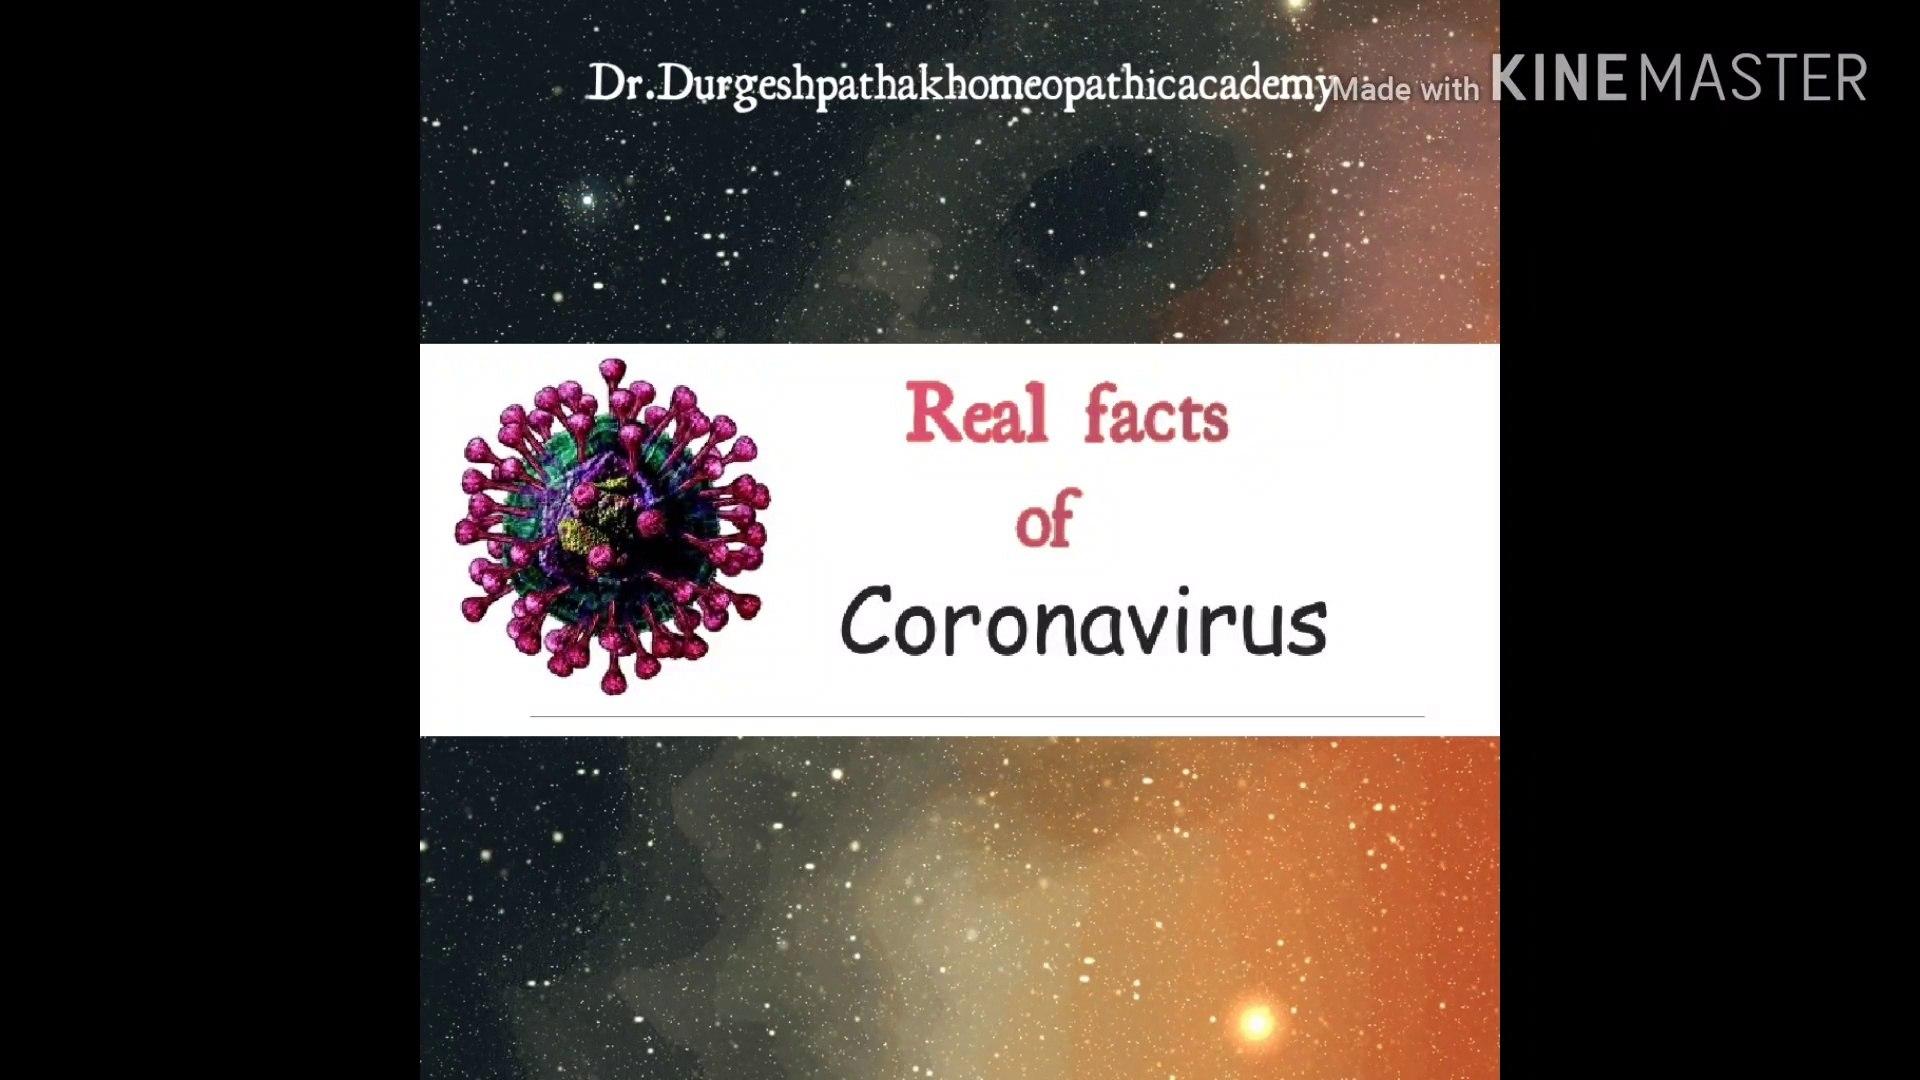 CORONA VIRUS-Real facts